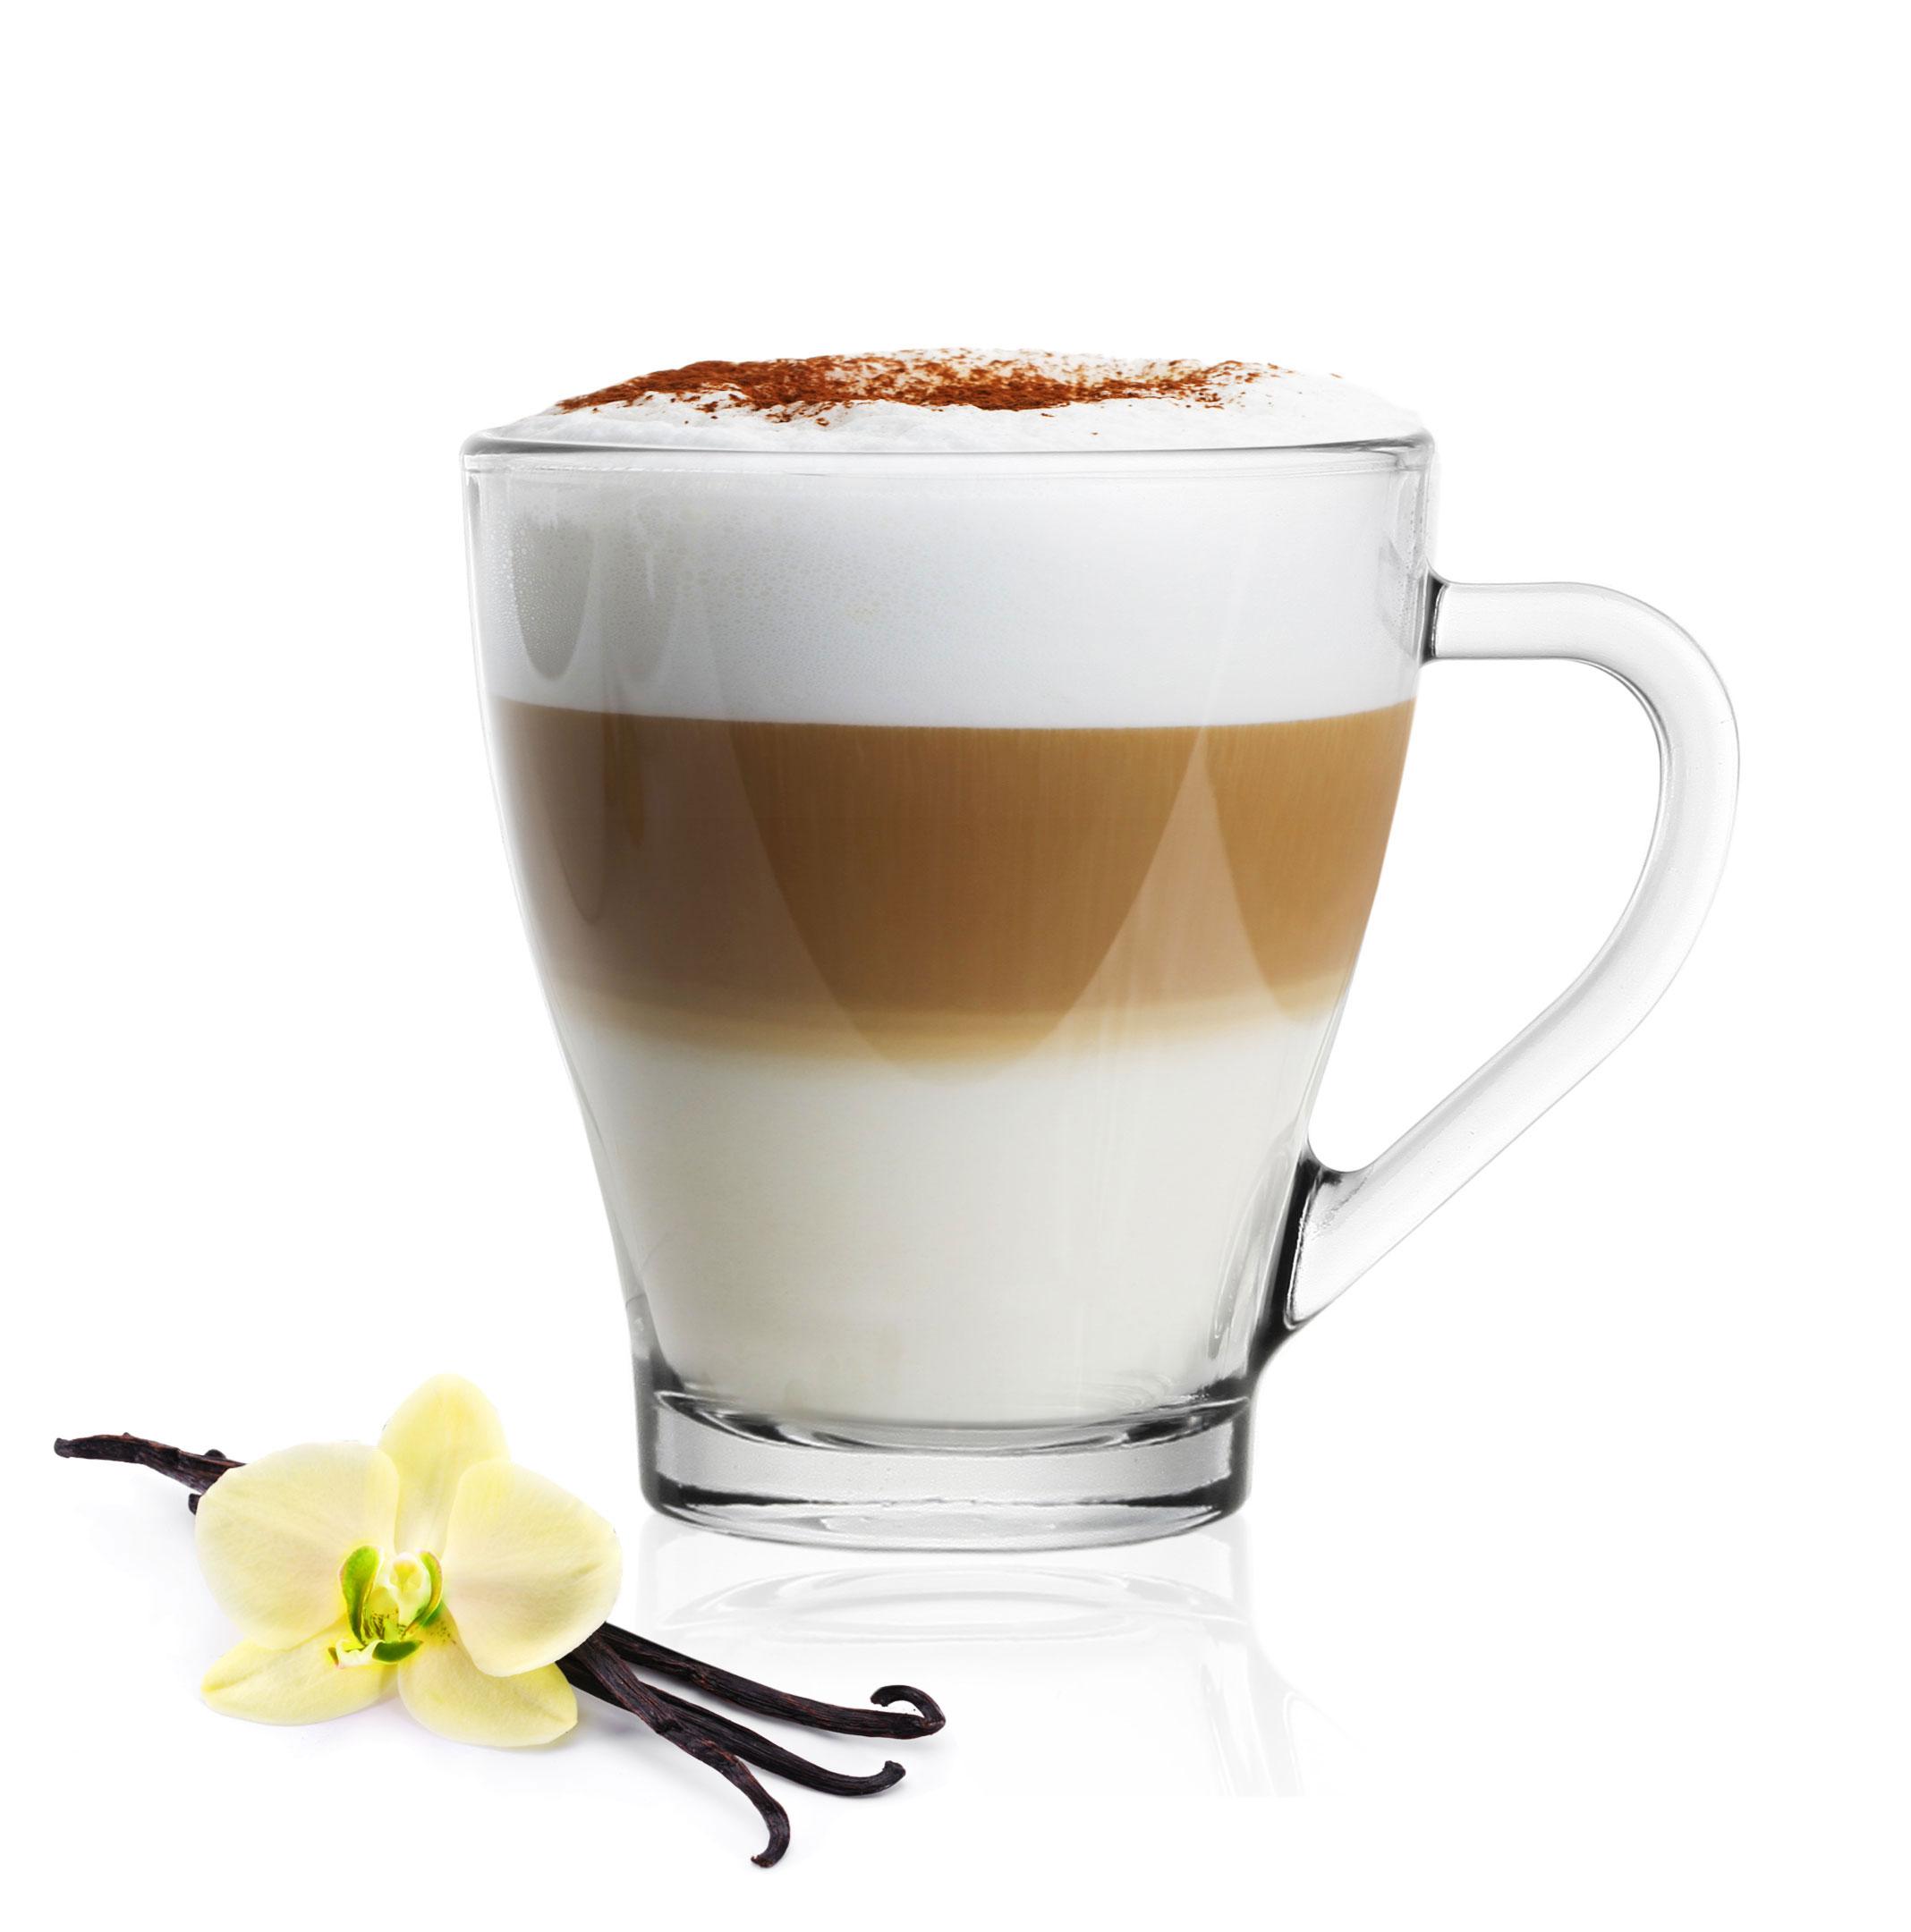 6 cappuccino tassen kaffeegl ser teegl ser 250 ml und 6 edelstahl l ffel gratis ebay. Black Bedroom Furniture Sets. Home Design Ideas